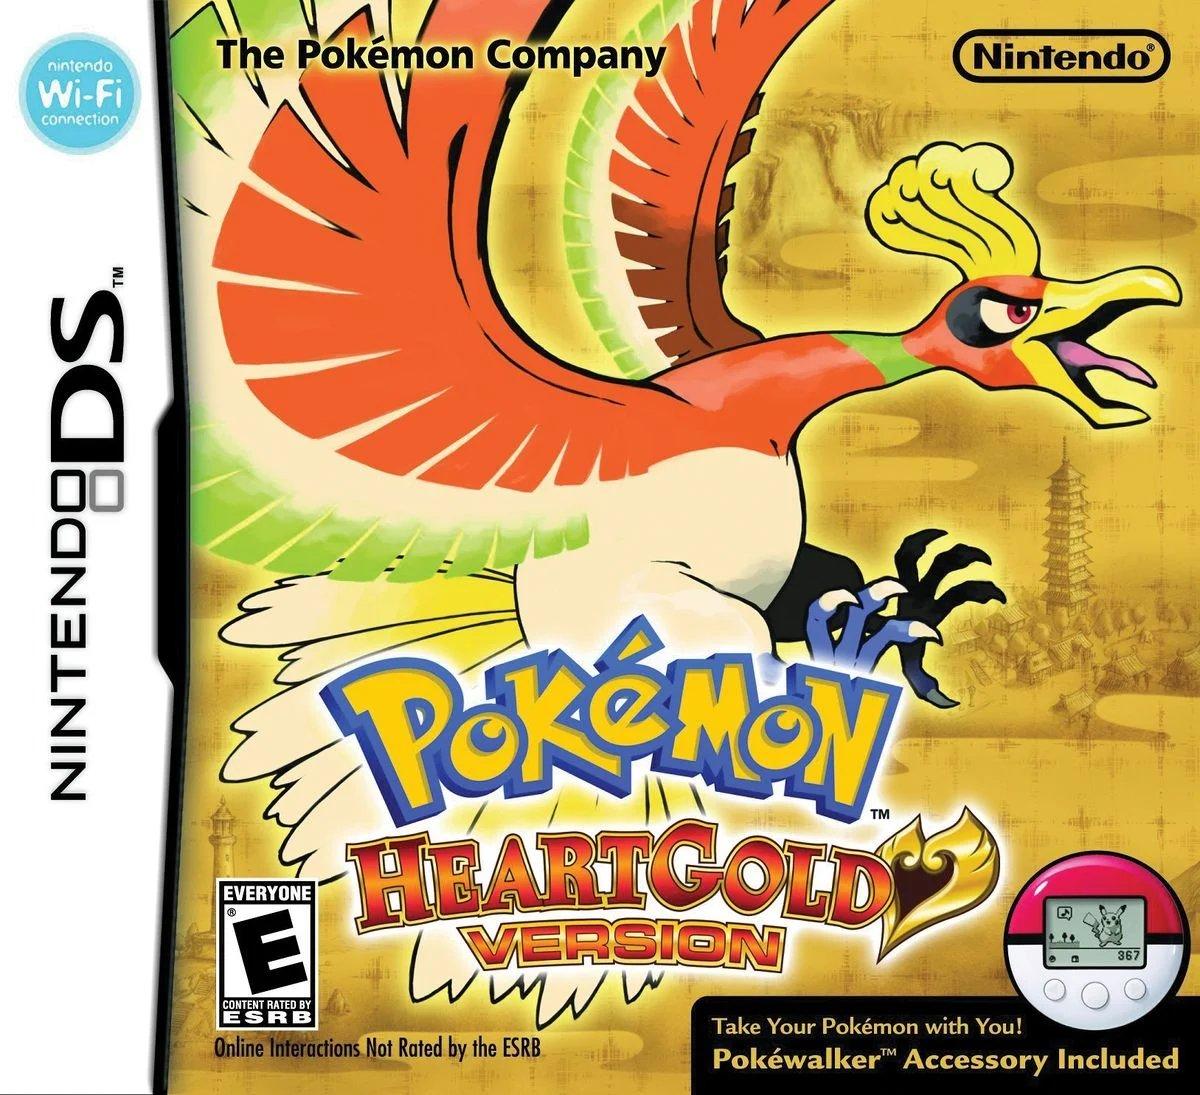 Compartilhe seu #Pokemon25  ============== Jogo Favorito Episódio Favorito Filme Favorito Pokémon Favorito ==============